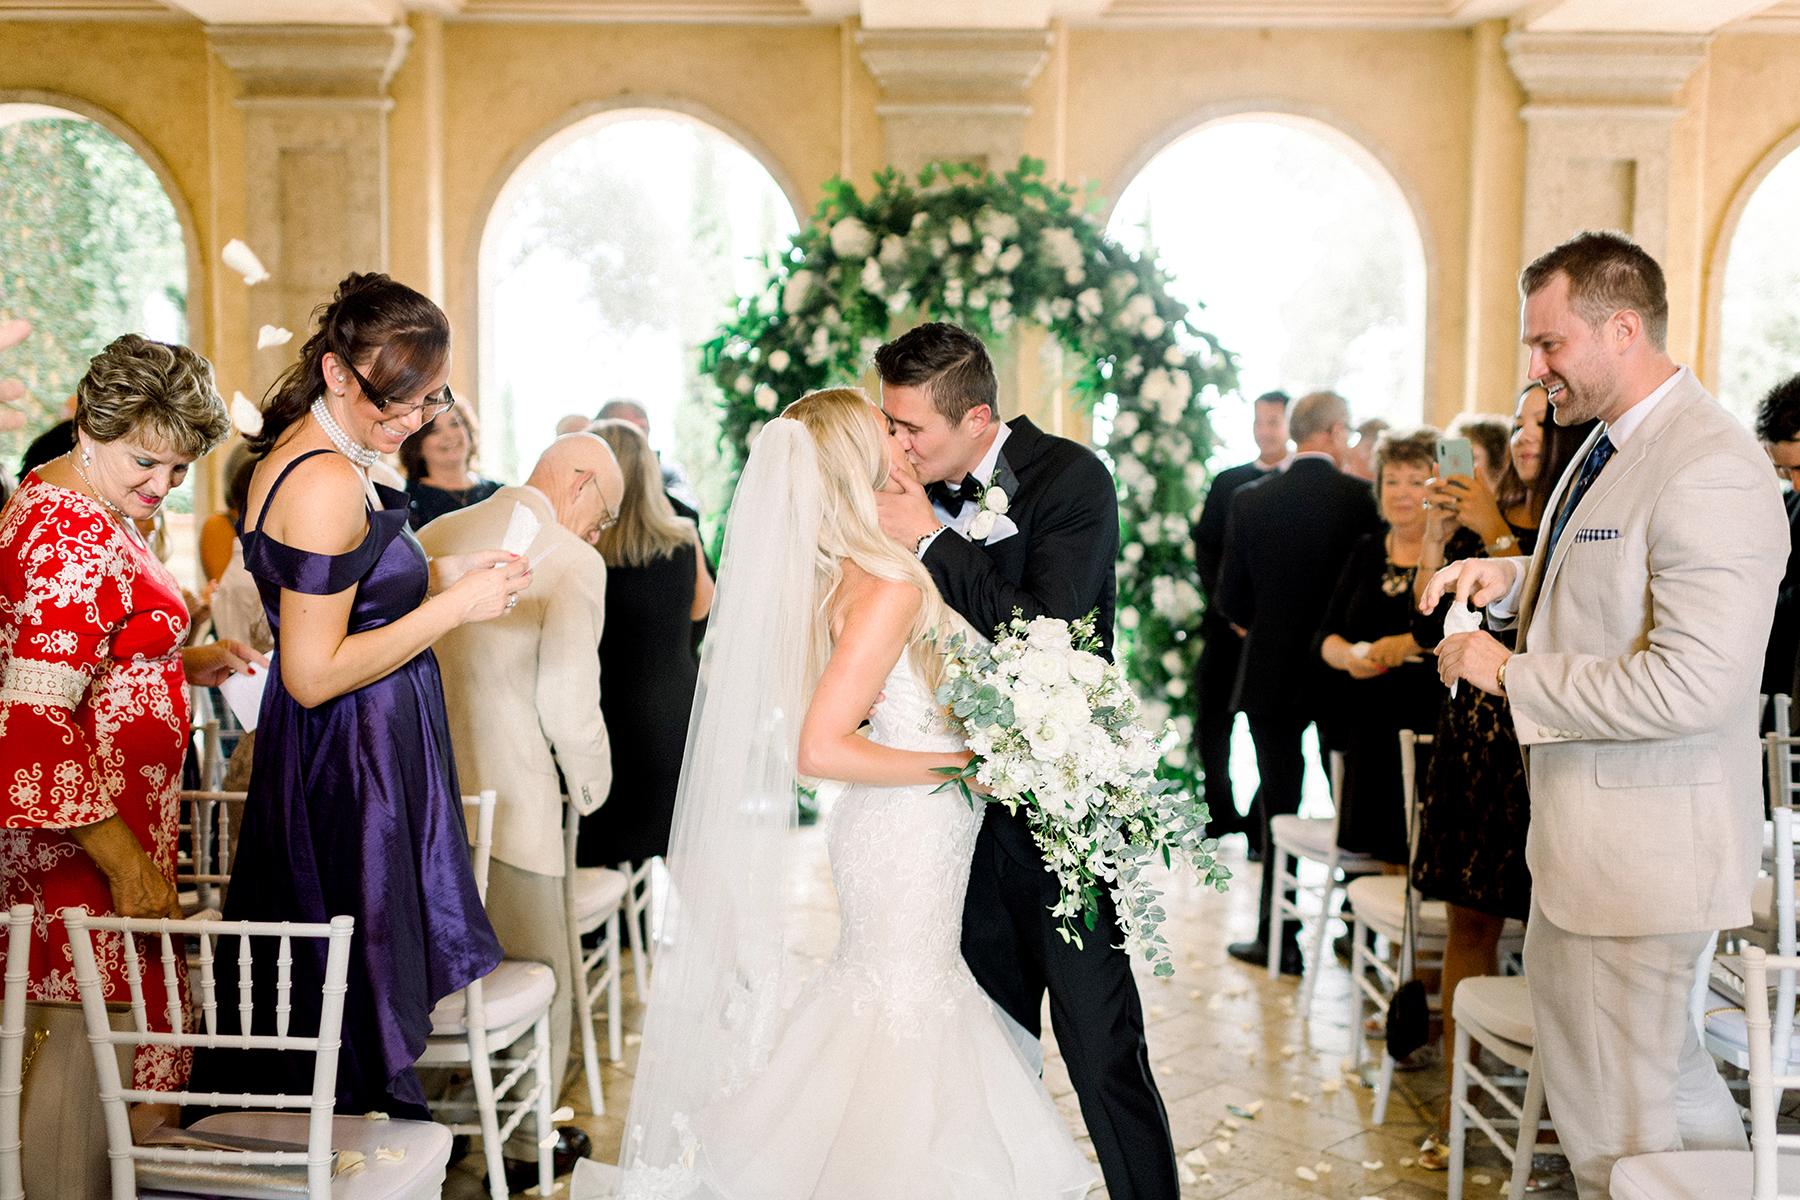 Classic White and Green Destination Wedding for Denver Couple Kristen Weaver43